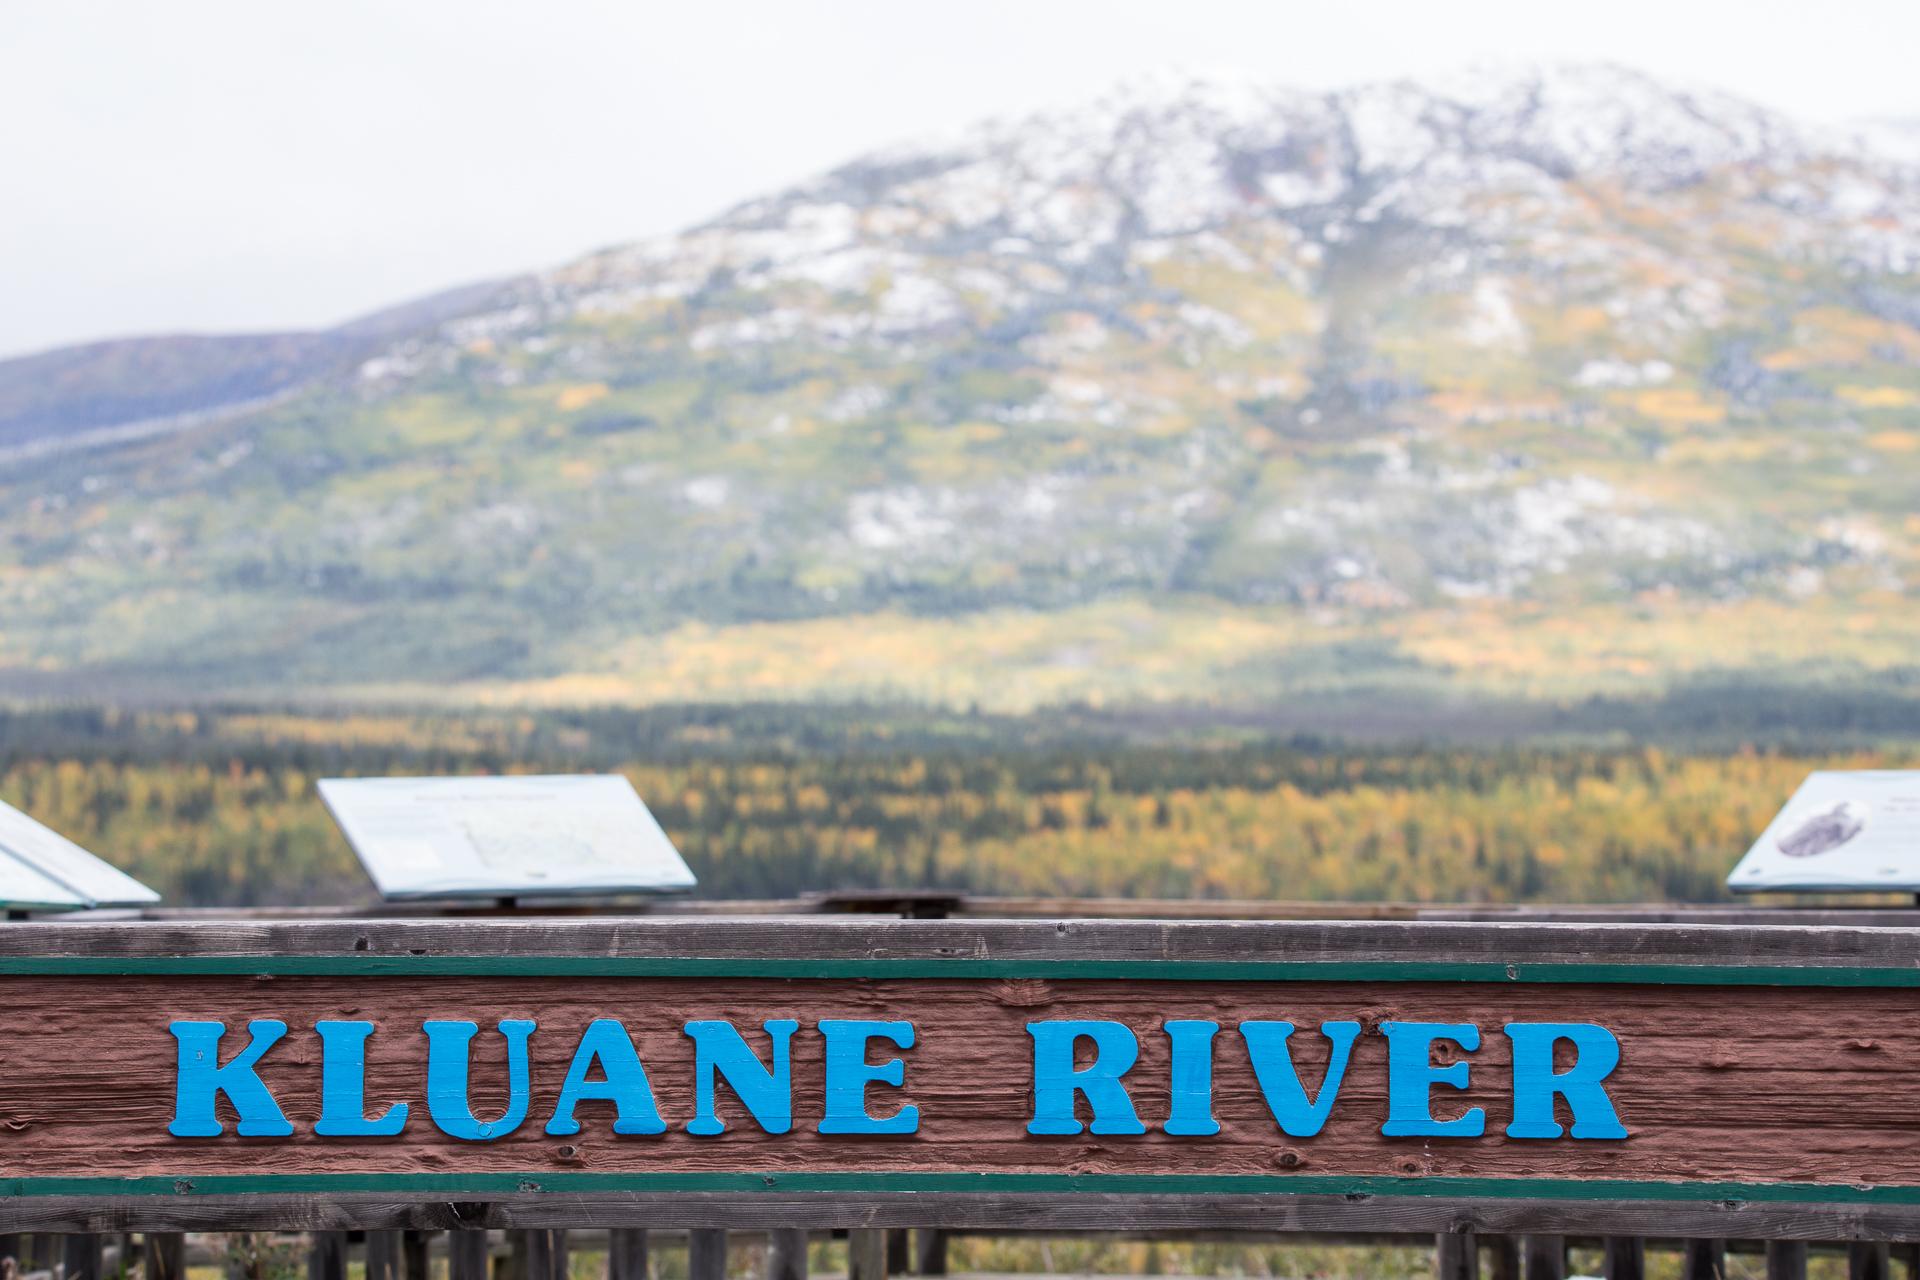 kluane river sign